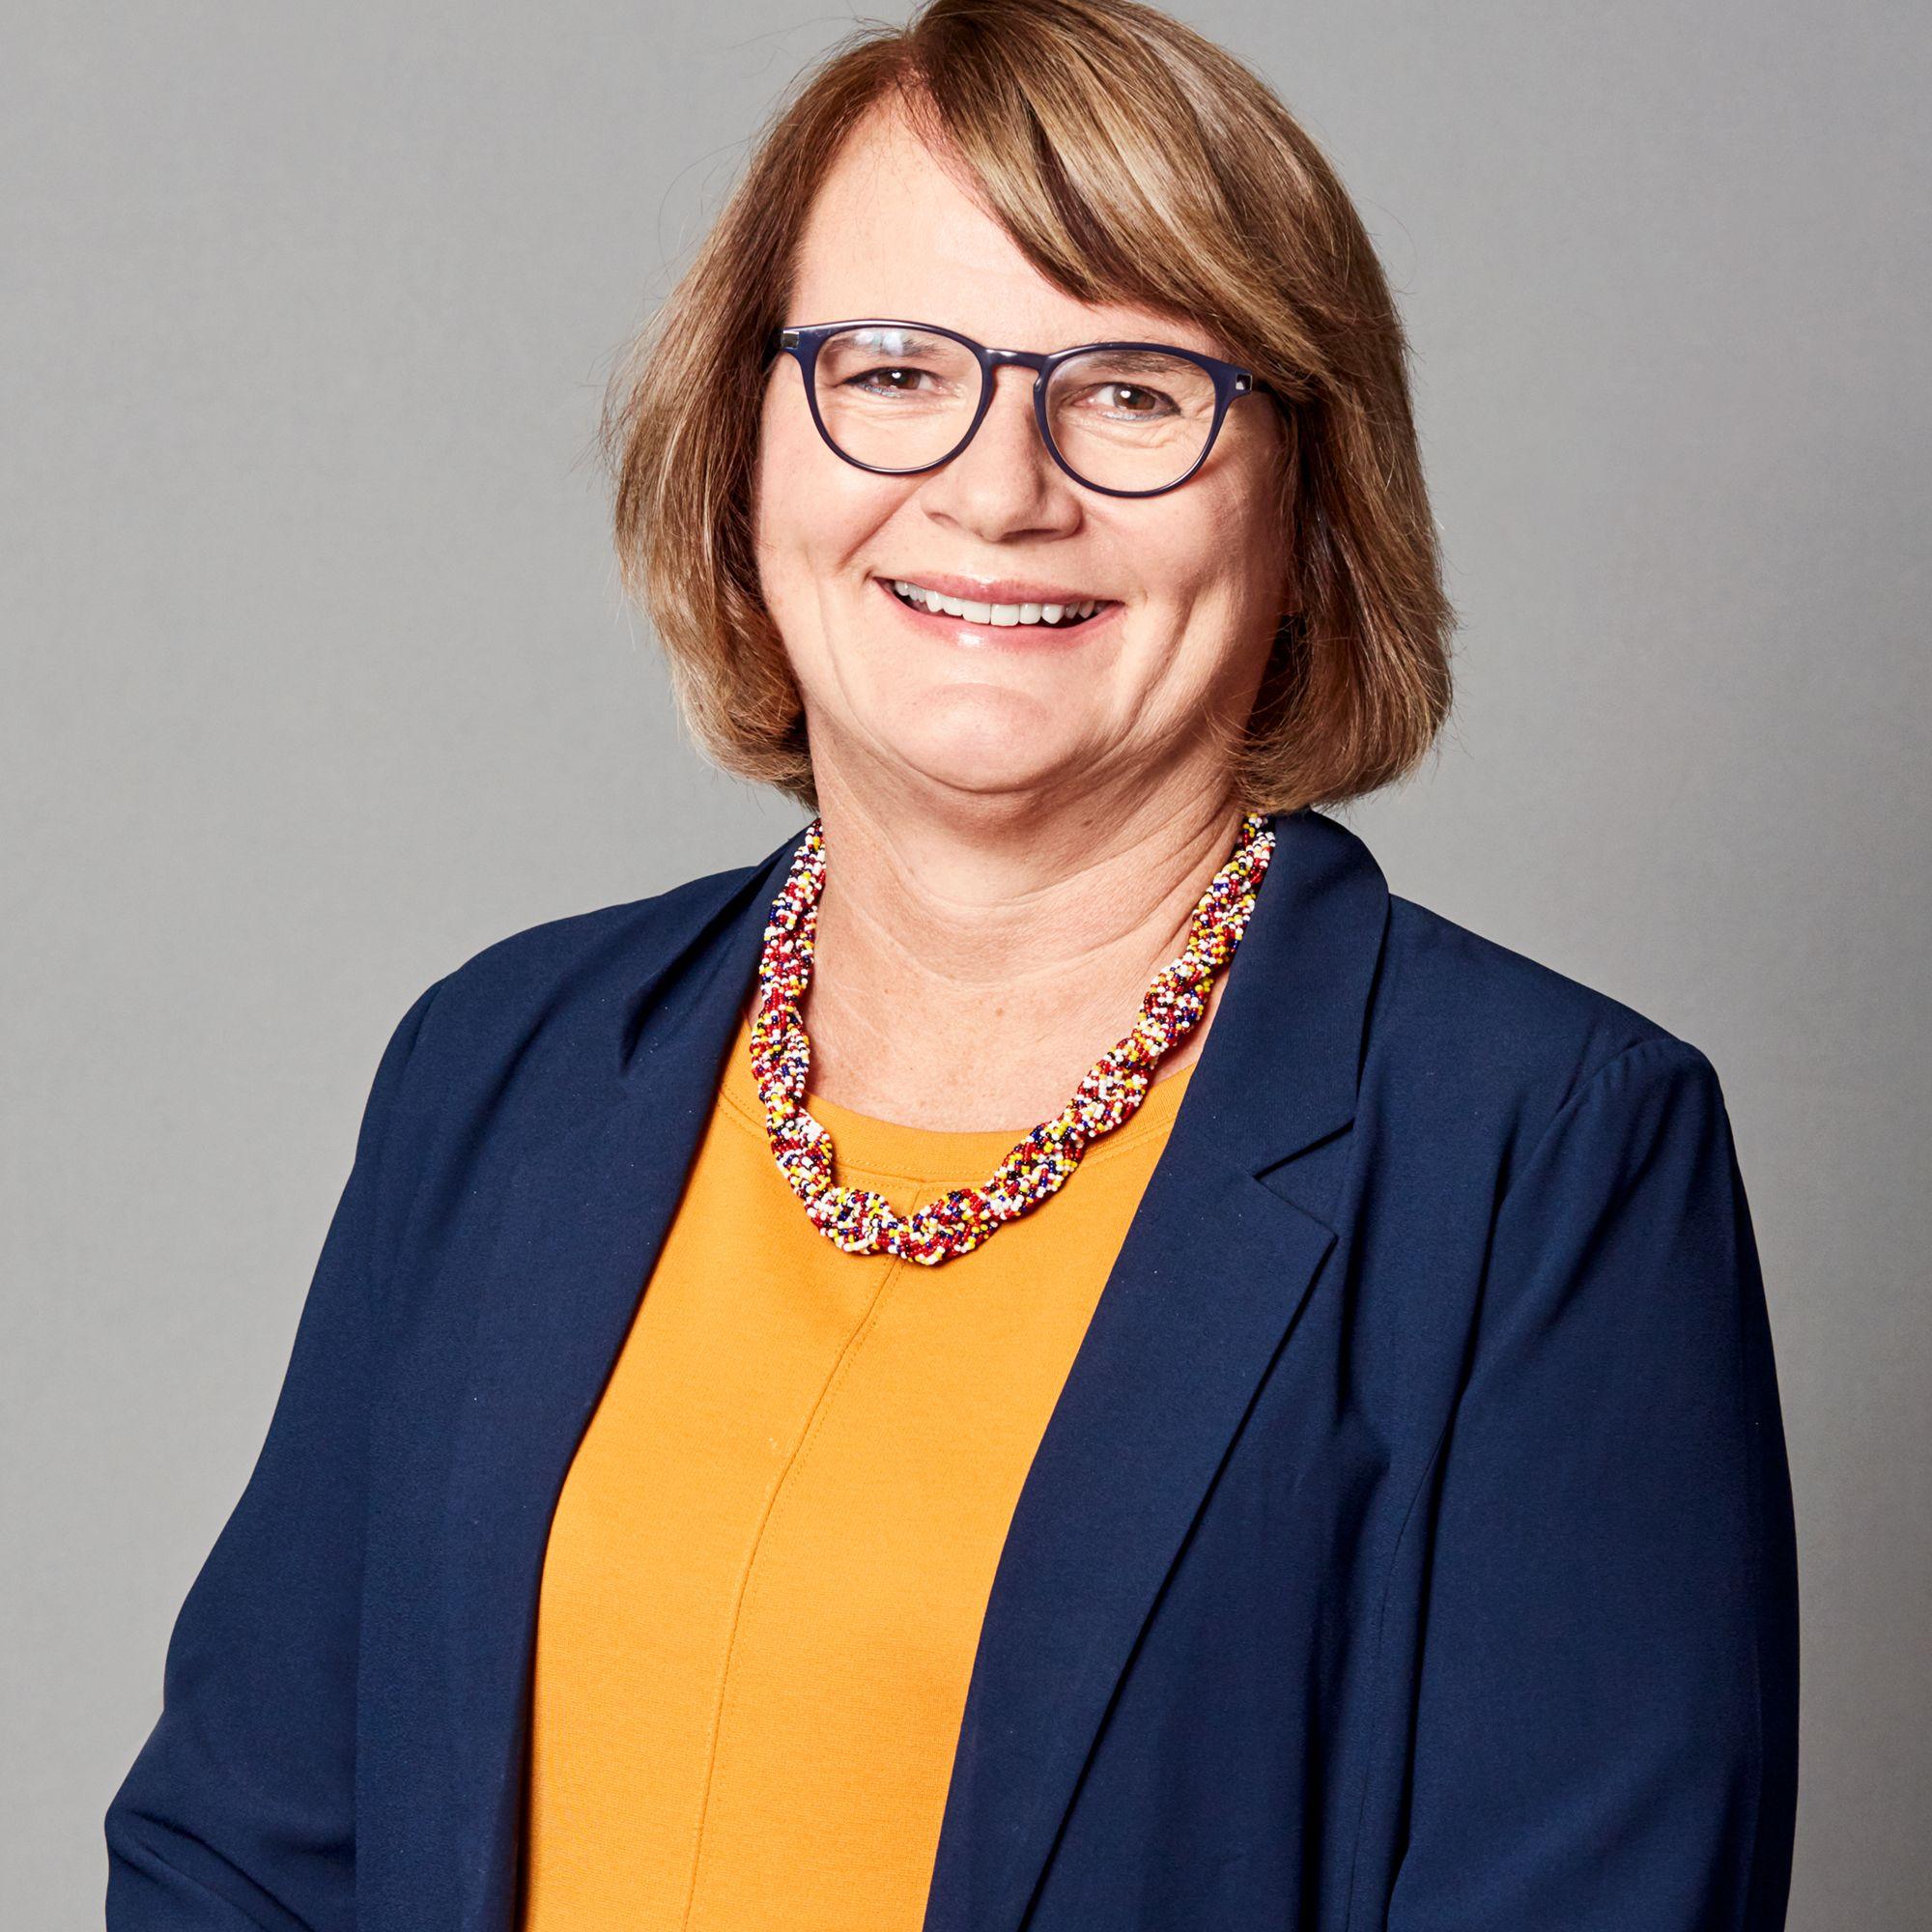 Trude Larsen